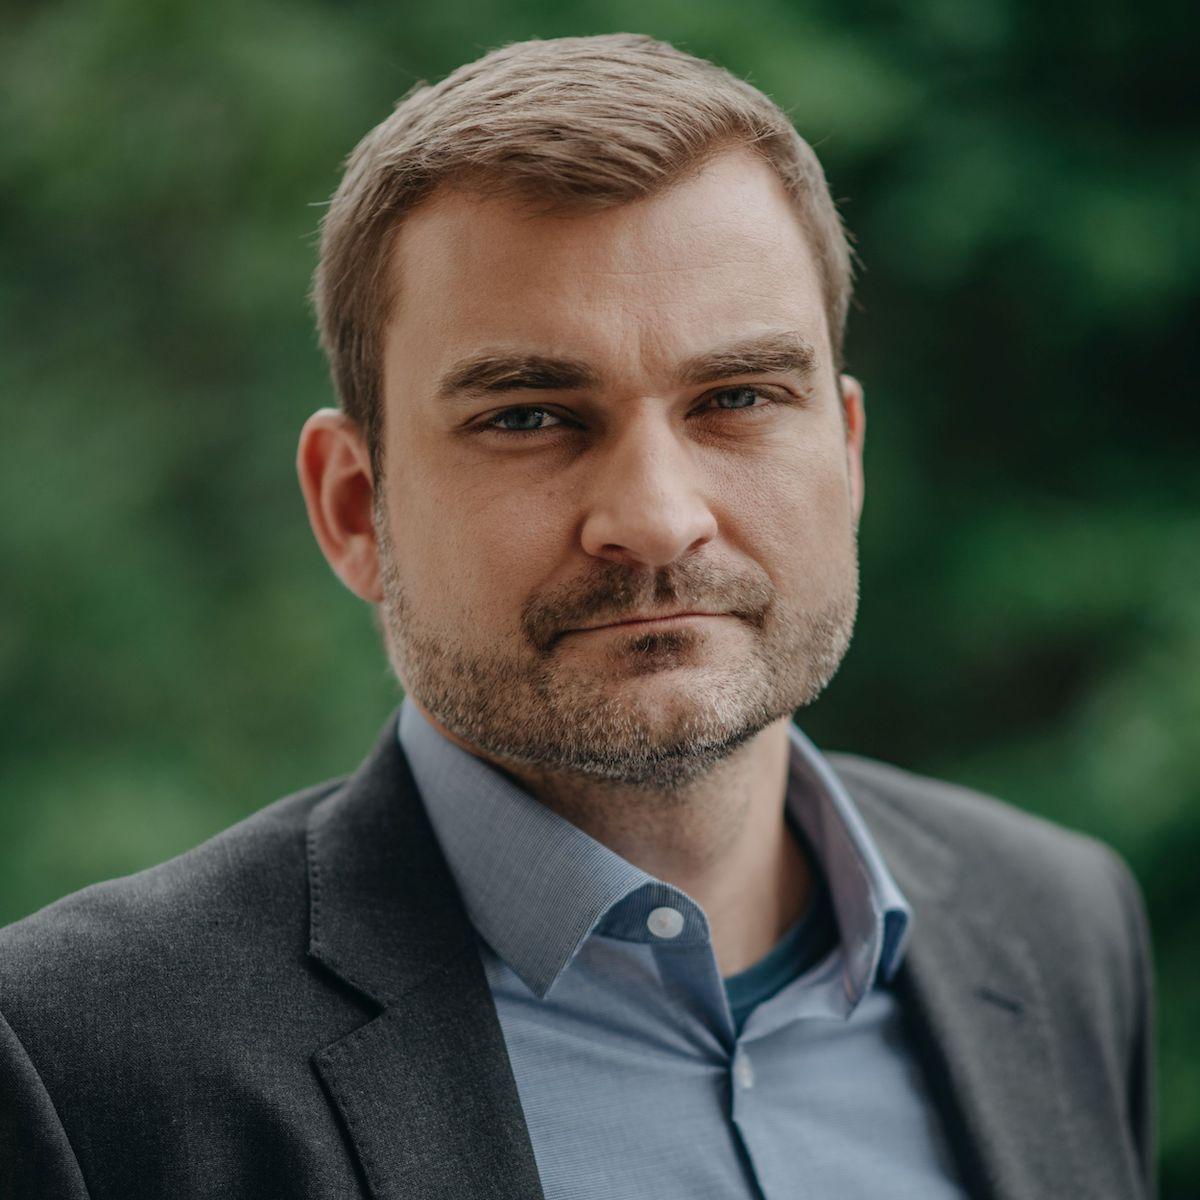 Petr Matyáštík